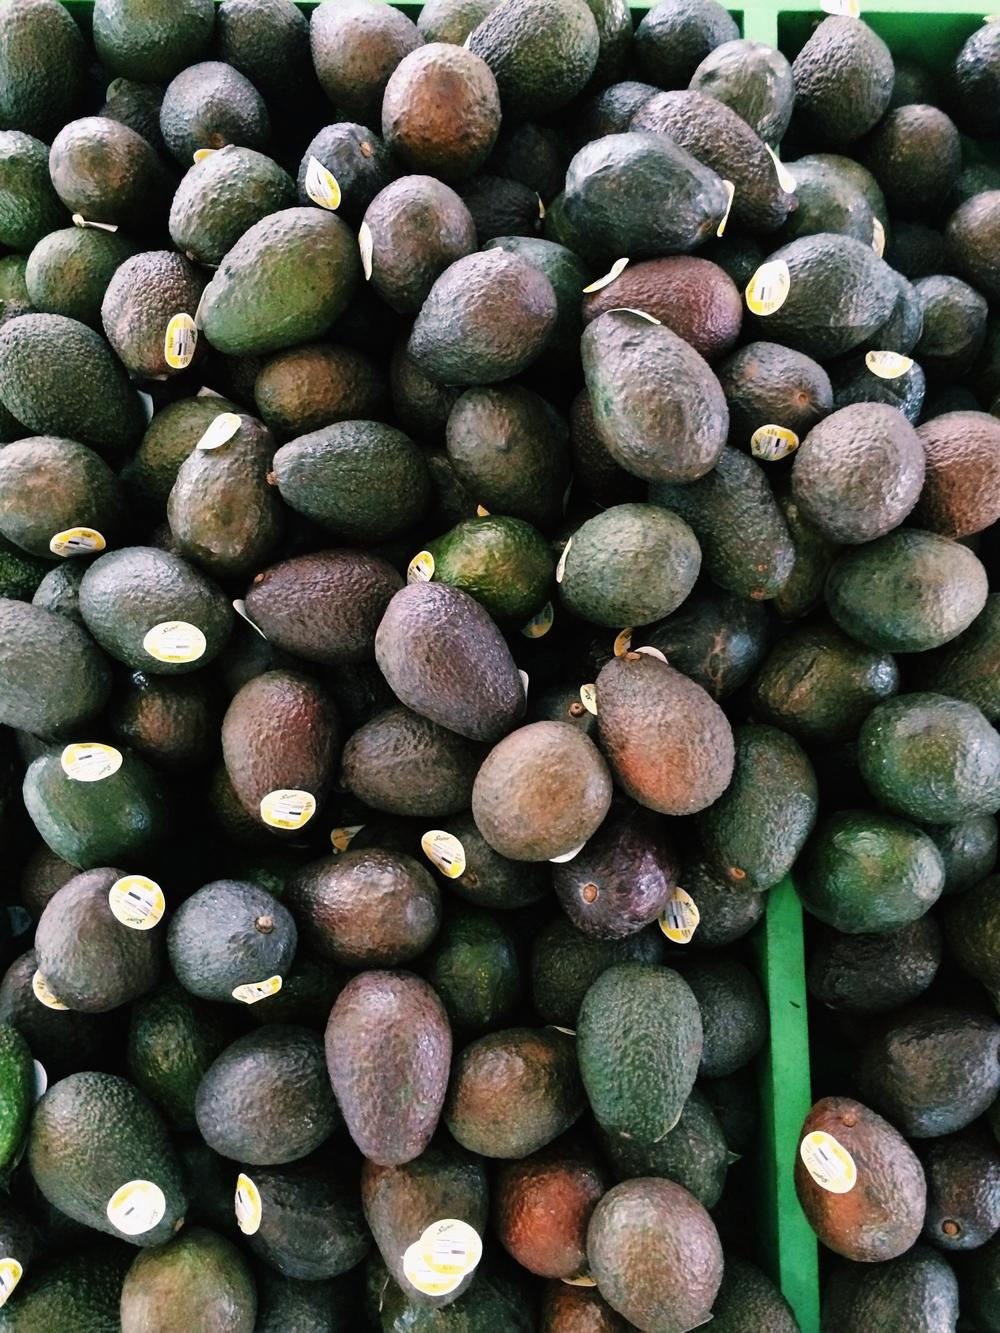 Charlotte-Farmers-market-Avocados-Lauren-Schwaiger-Blog.jpg